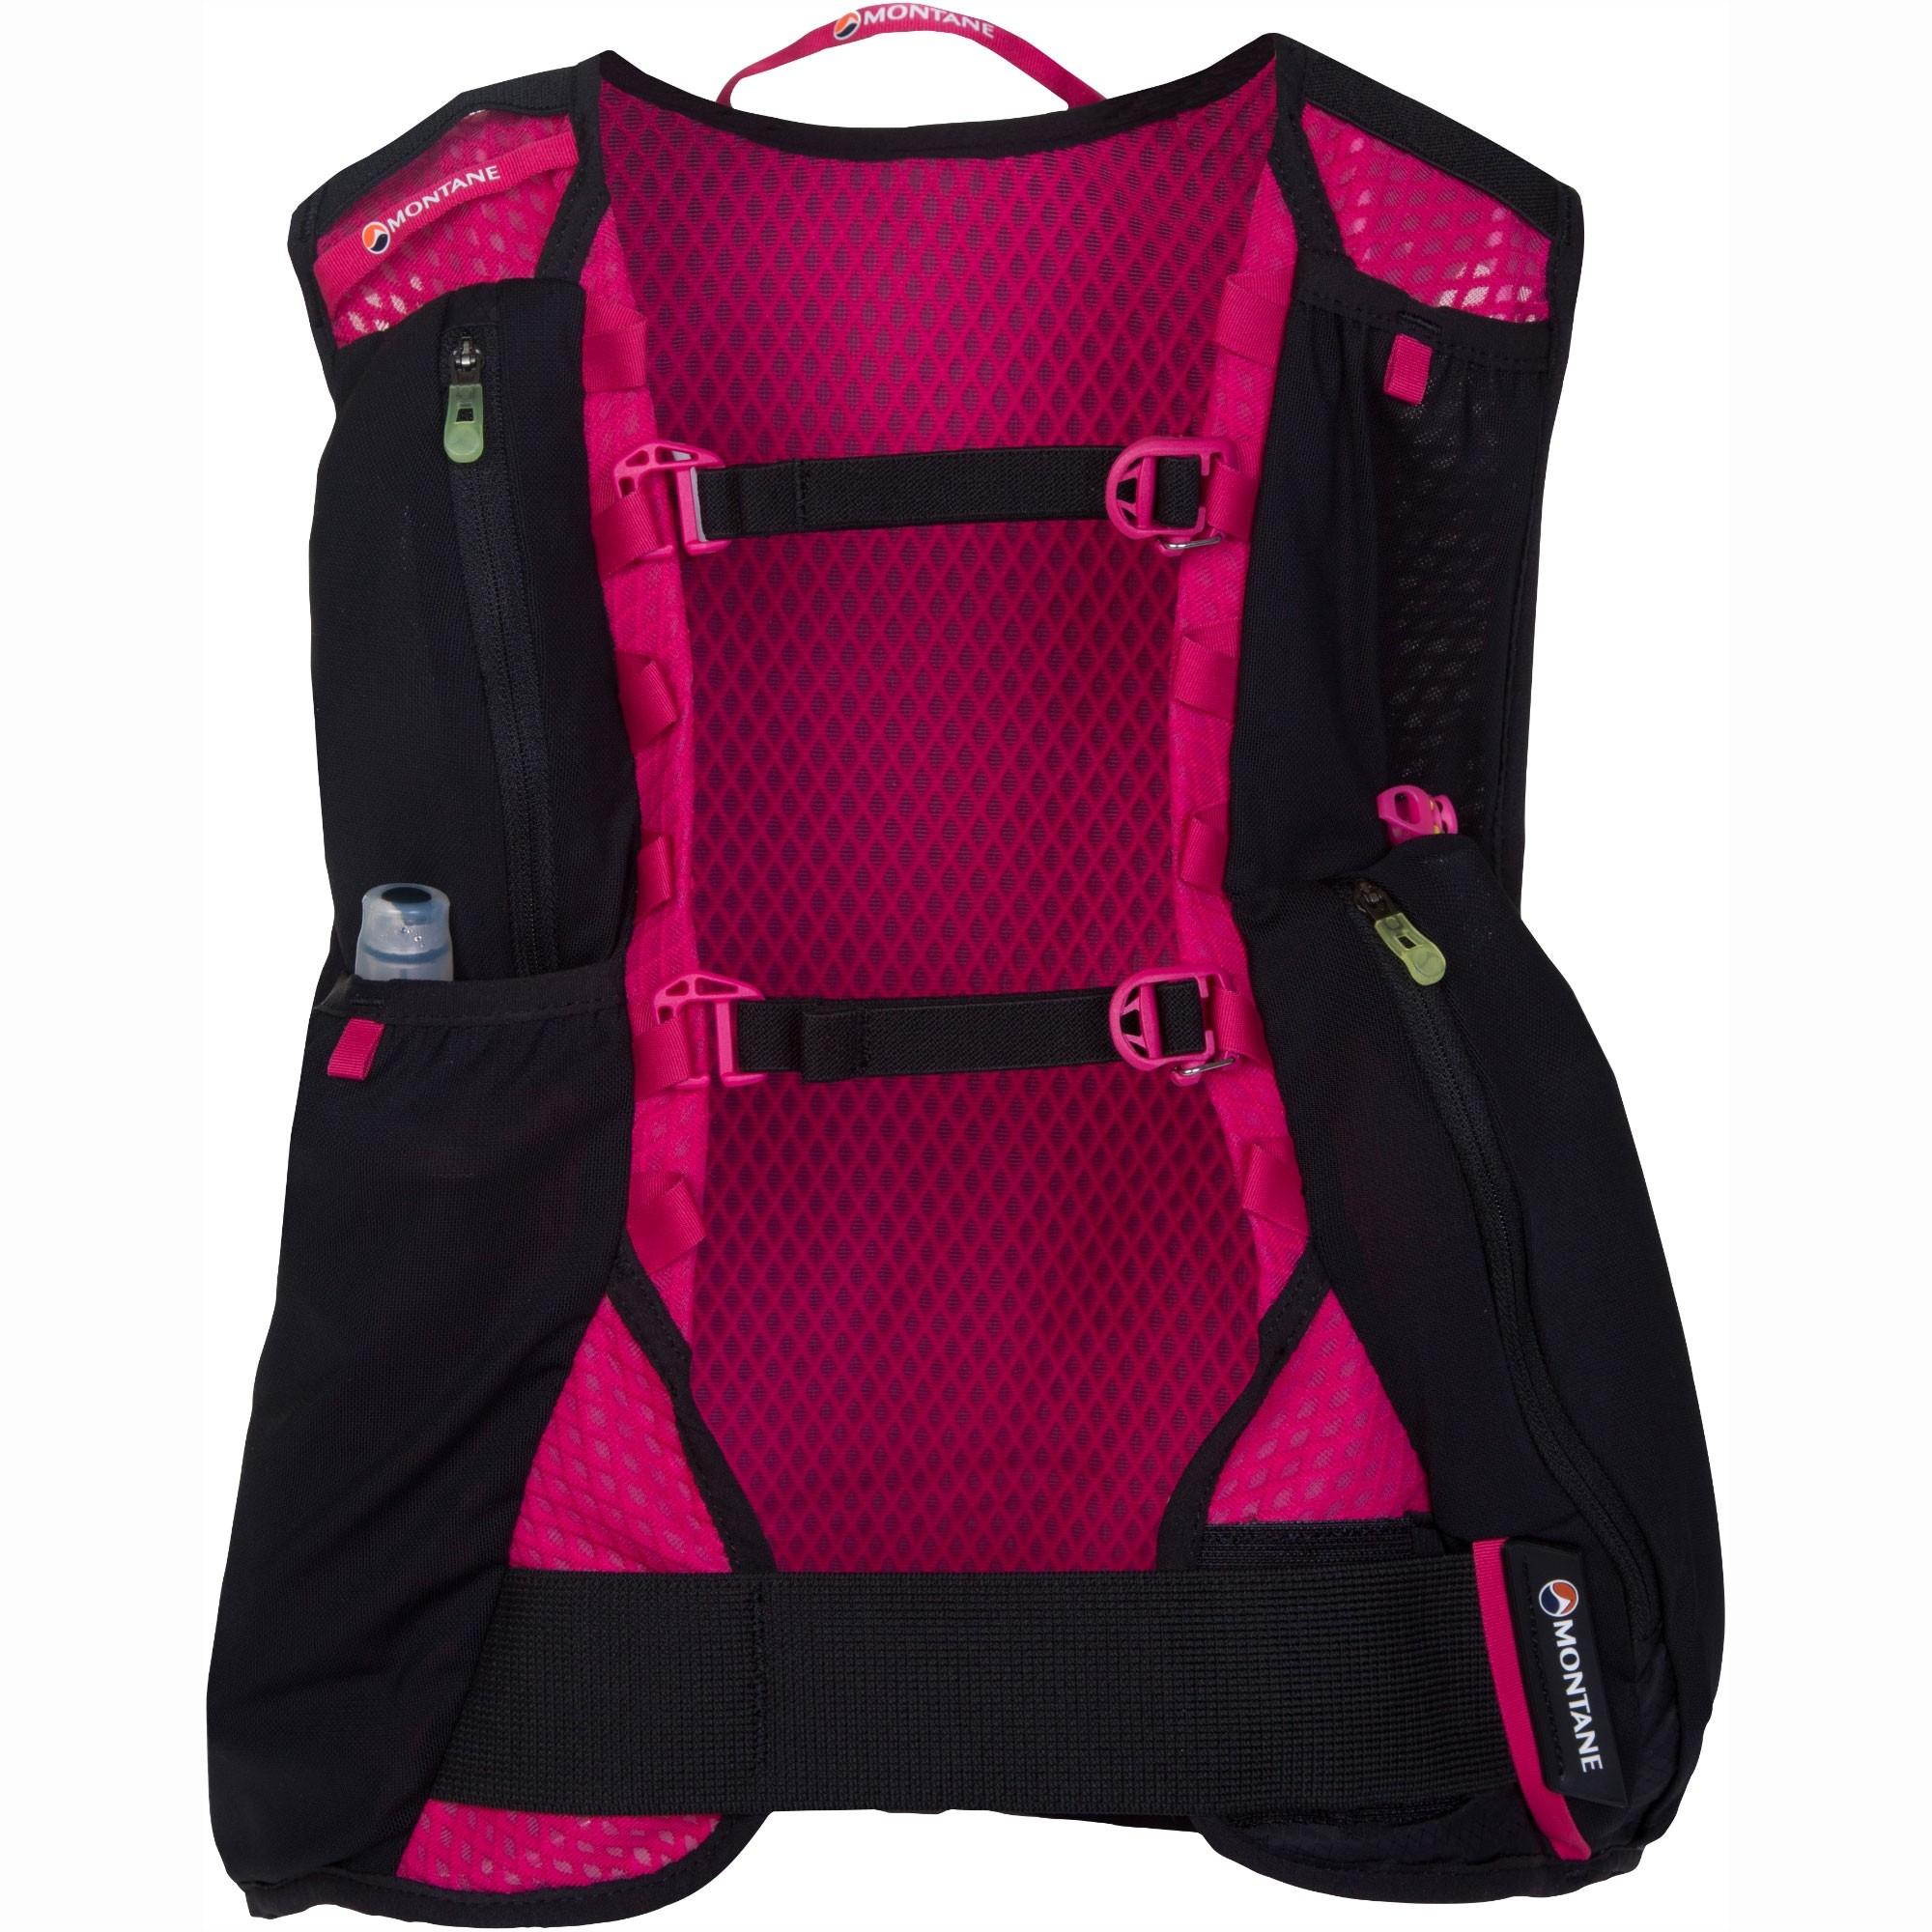 Montane Via Claw4 Women's Trail Running Pack - Black/Dolomite Pink/Sulphur Yellow